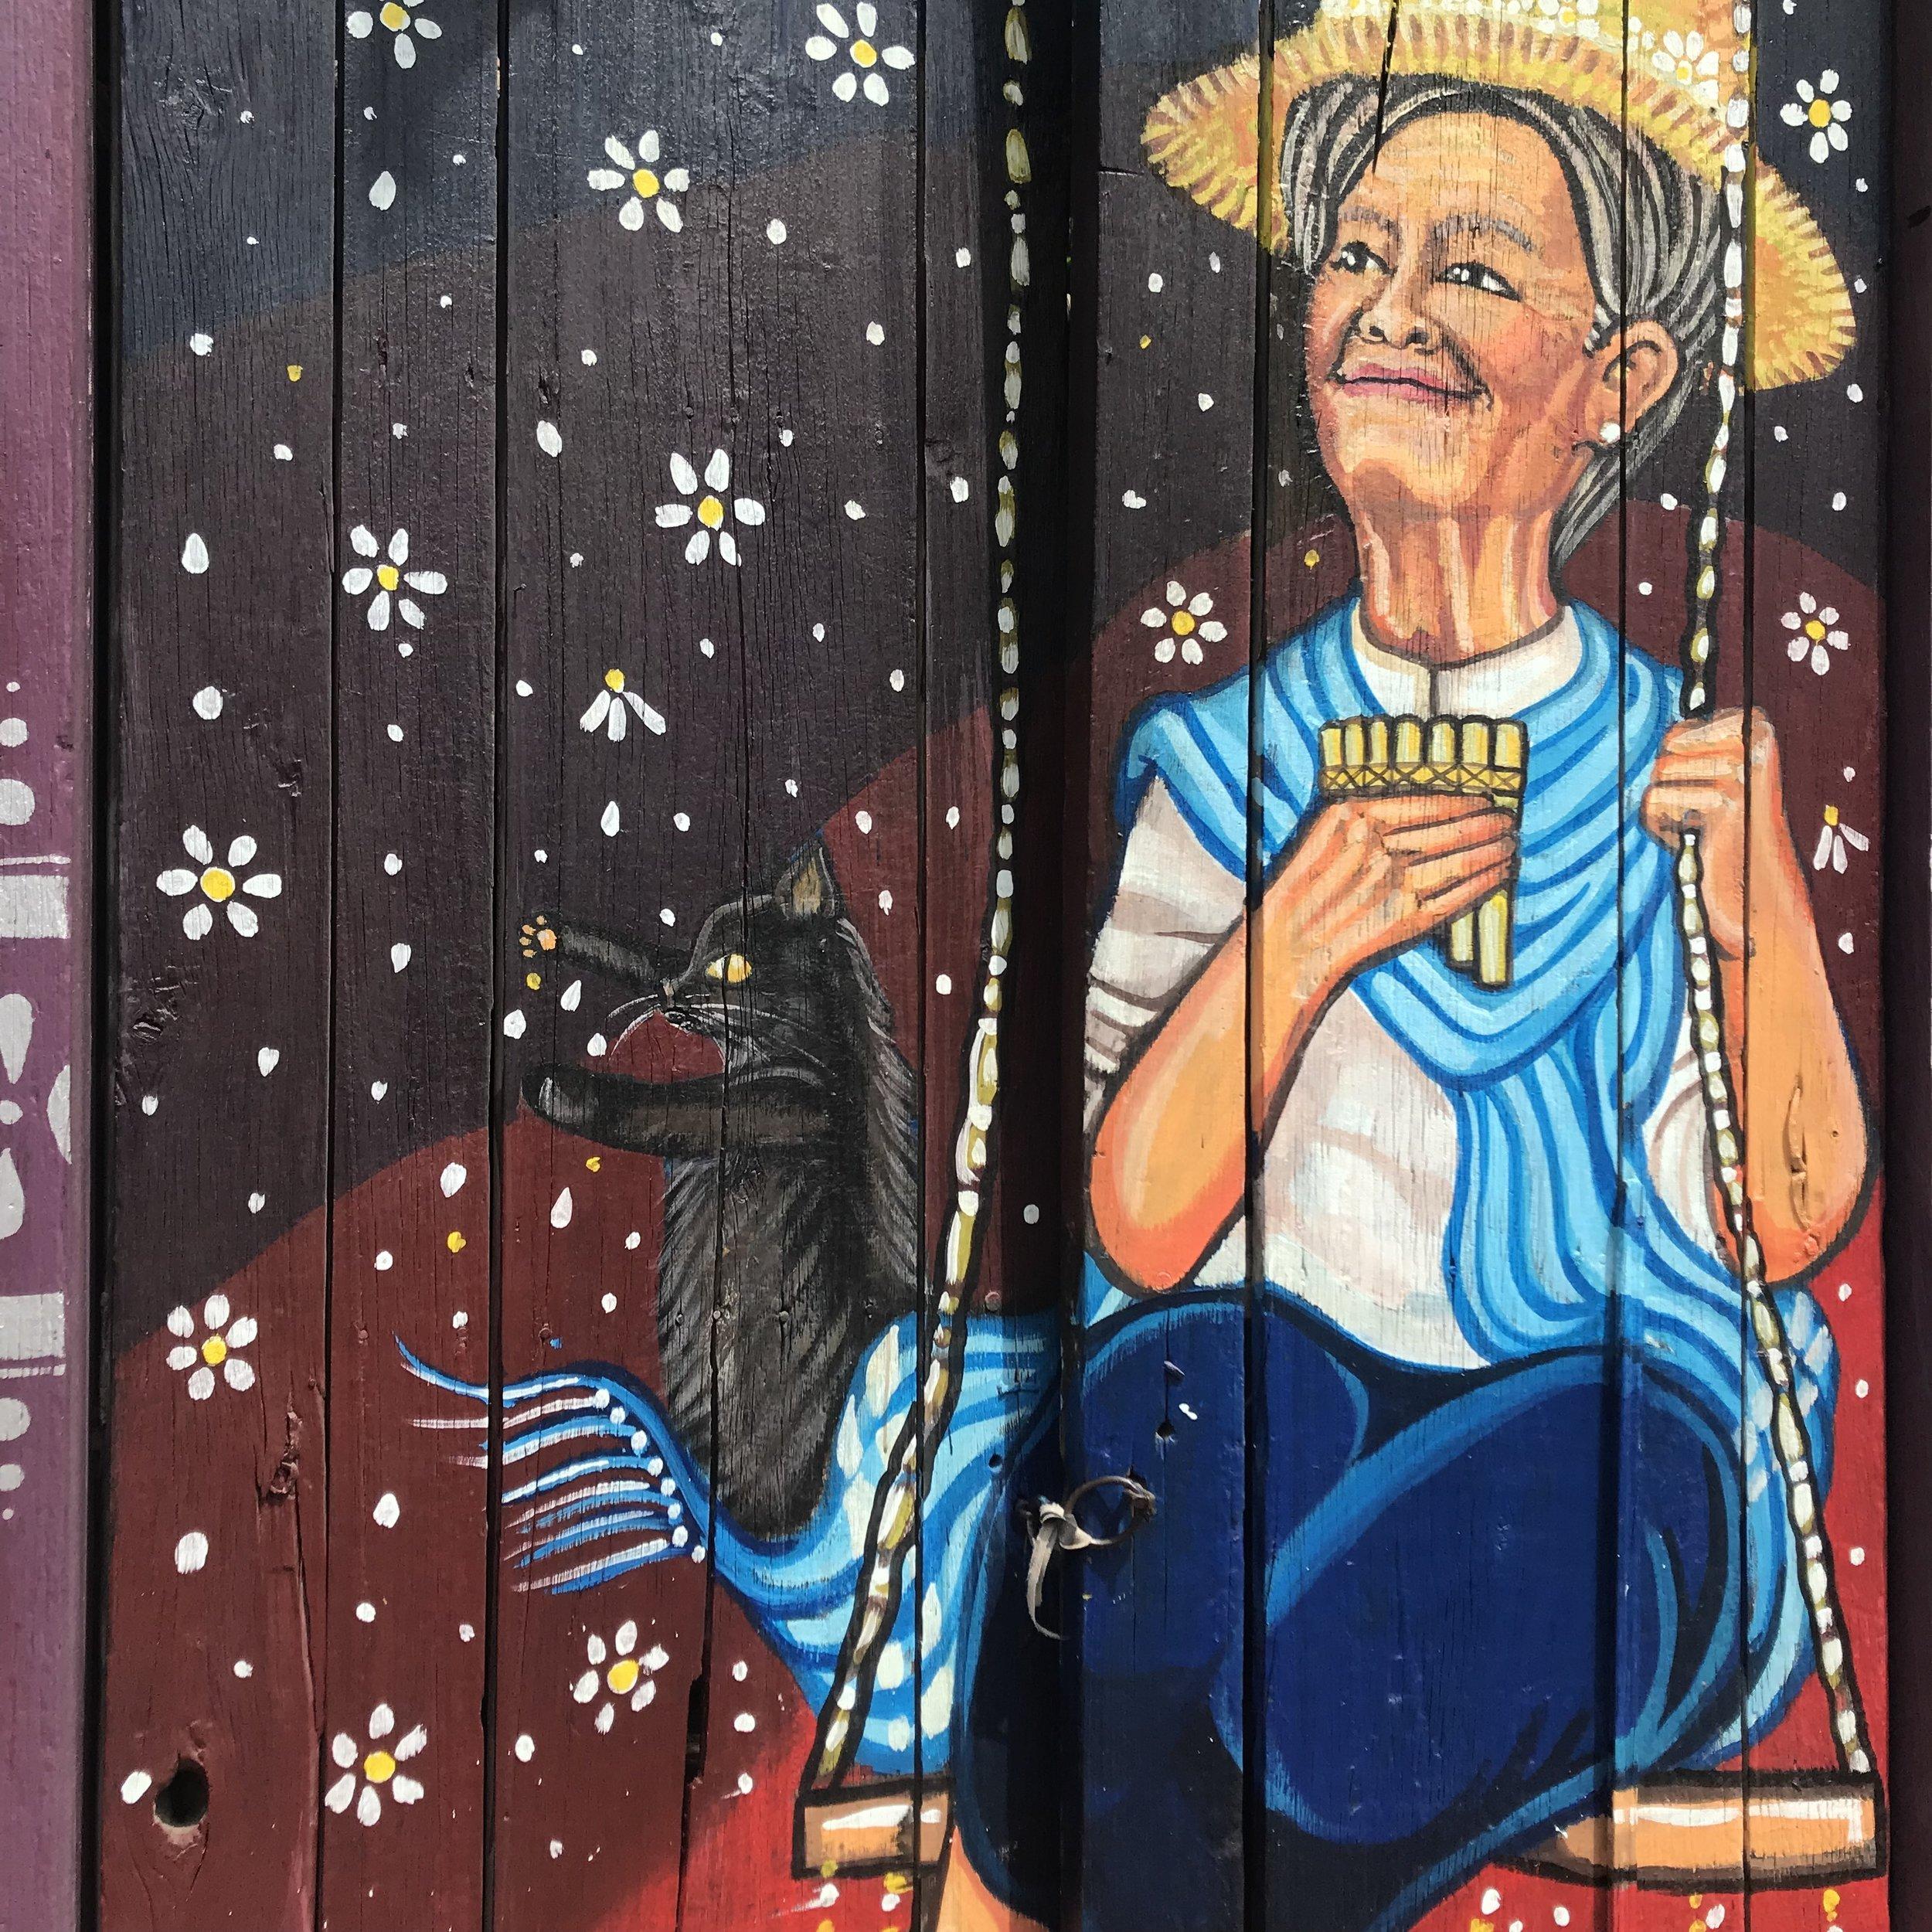 Beautiful Ecuadorian street art.